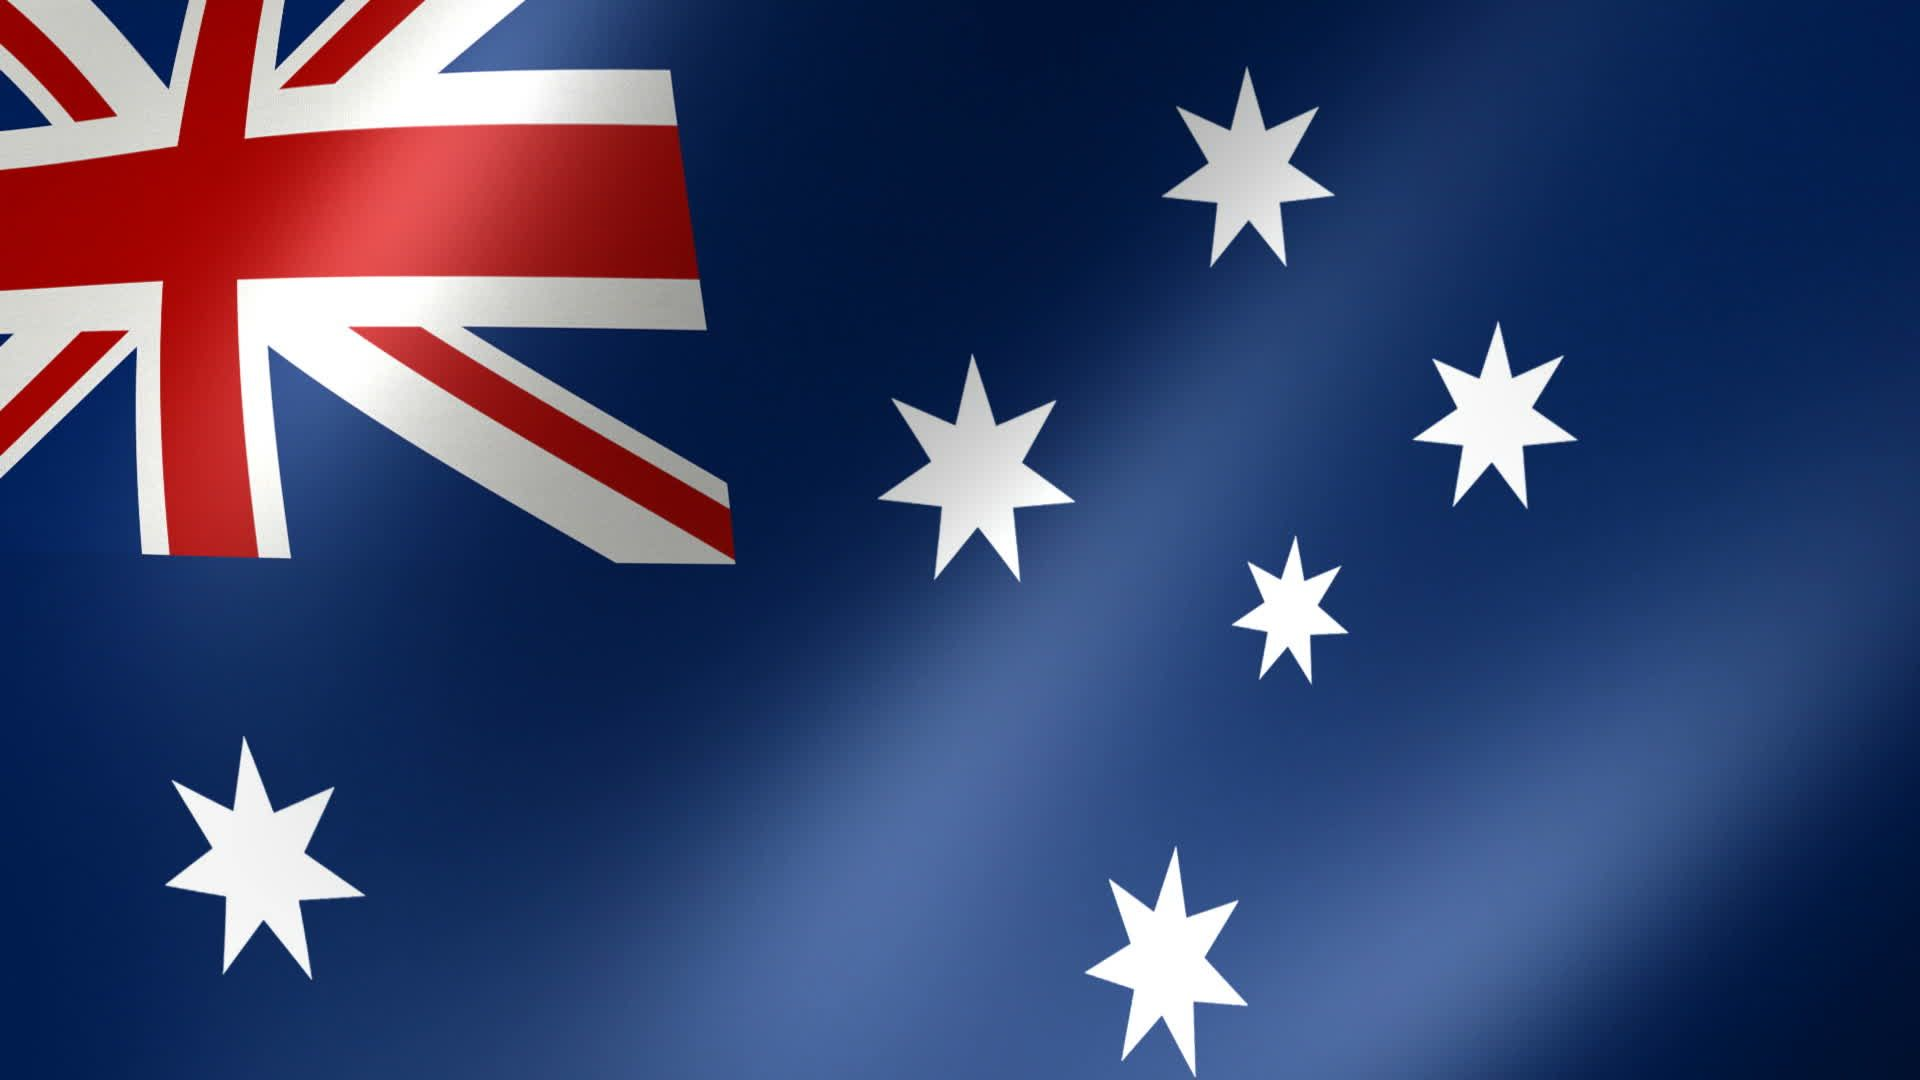 Wallpaper Australia Flag Widescreen Australia Wallpaper Australian Flags Australia Flag